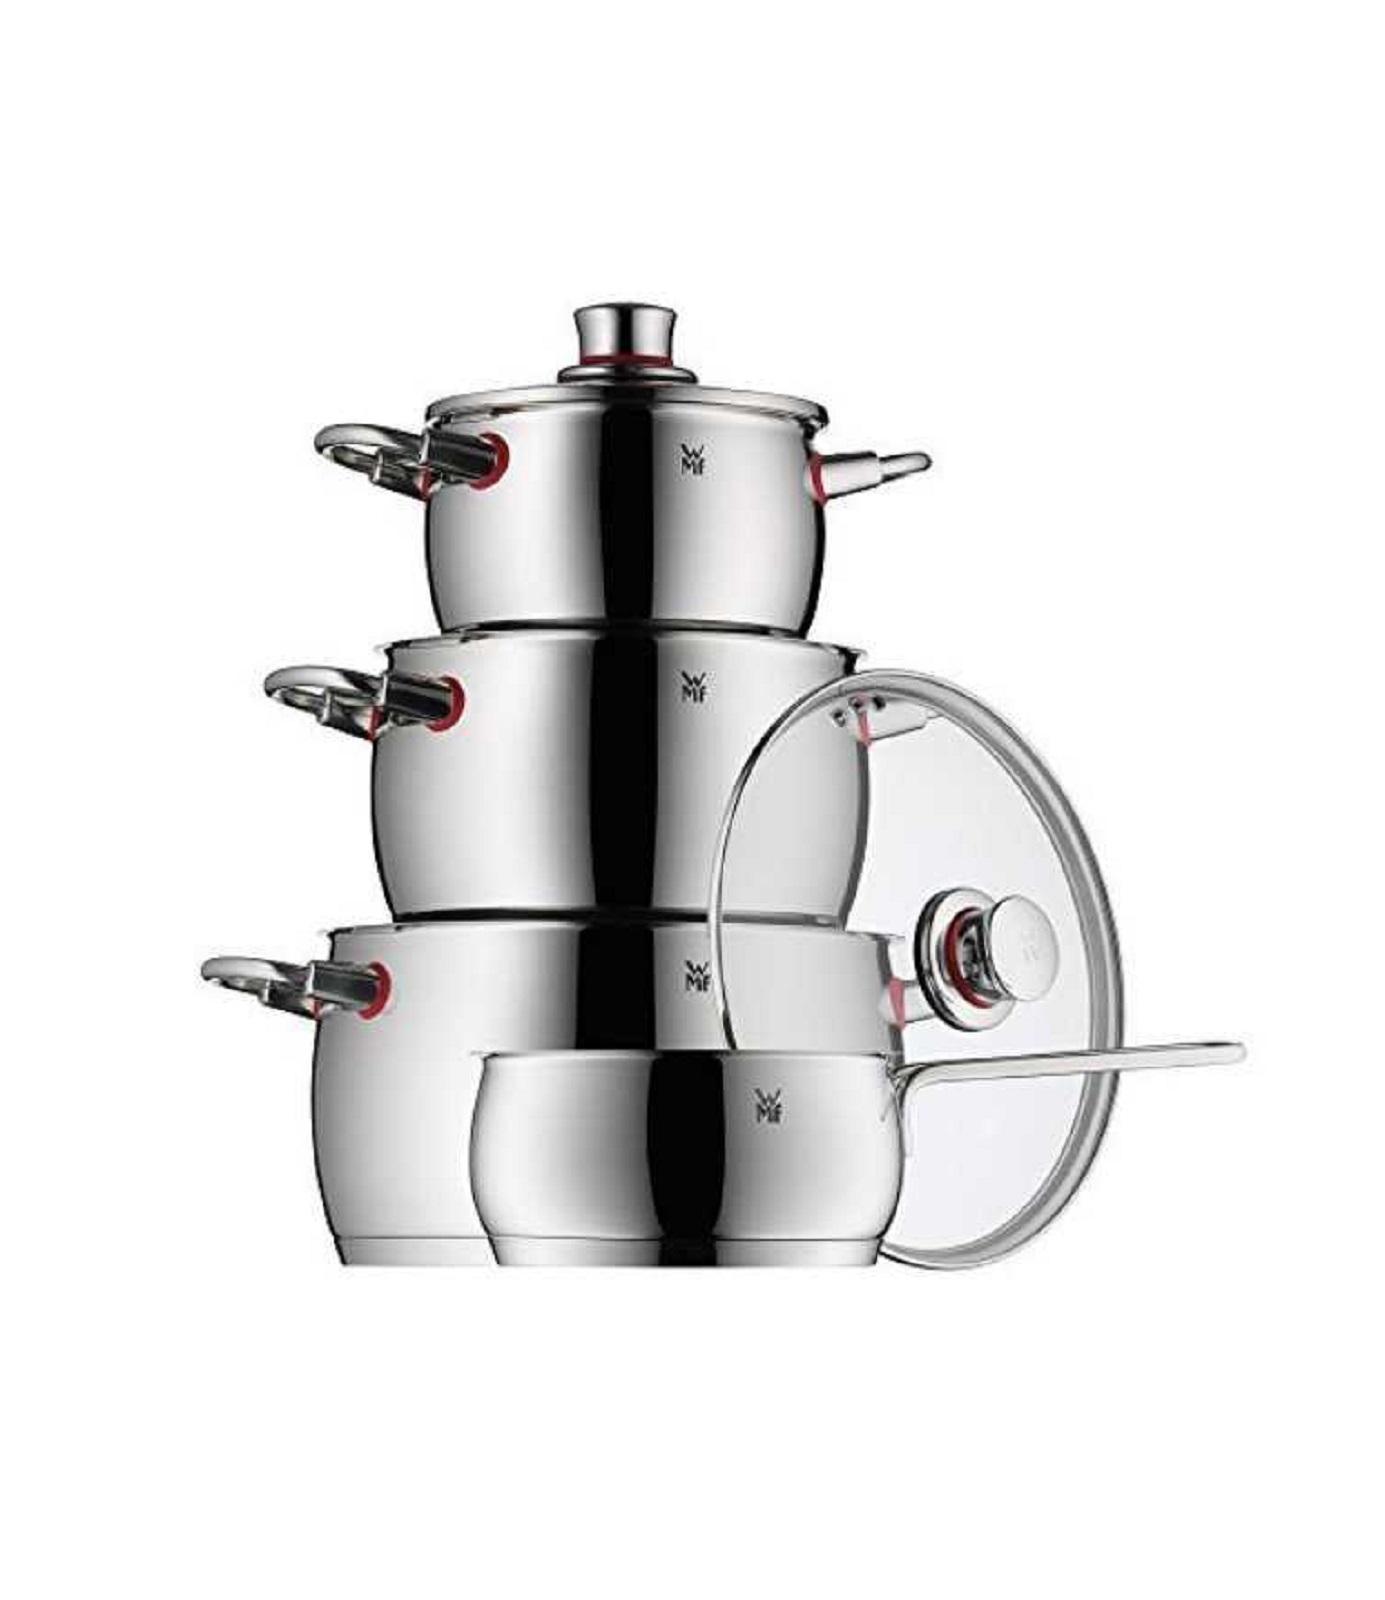 Набор кухонной посуды WMF QUALITY ONE серебристый,, 4 предмета WMF 07 7414 6380 sp фото 0